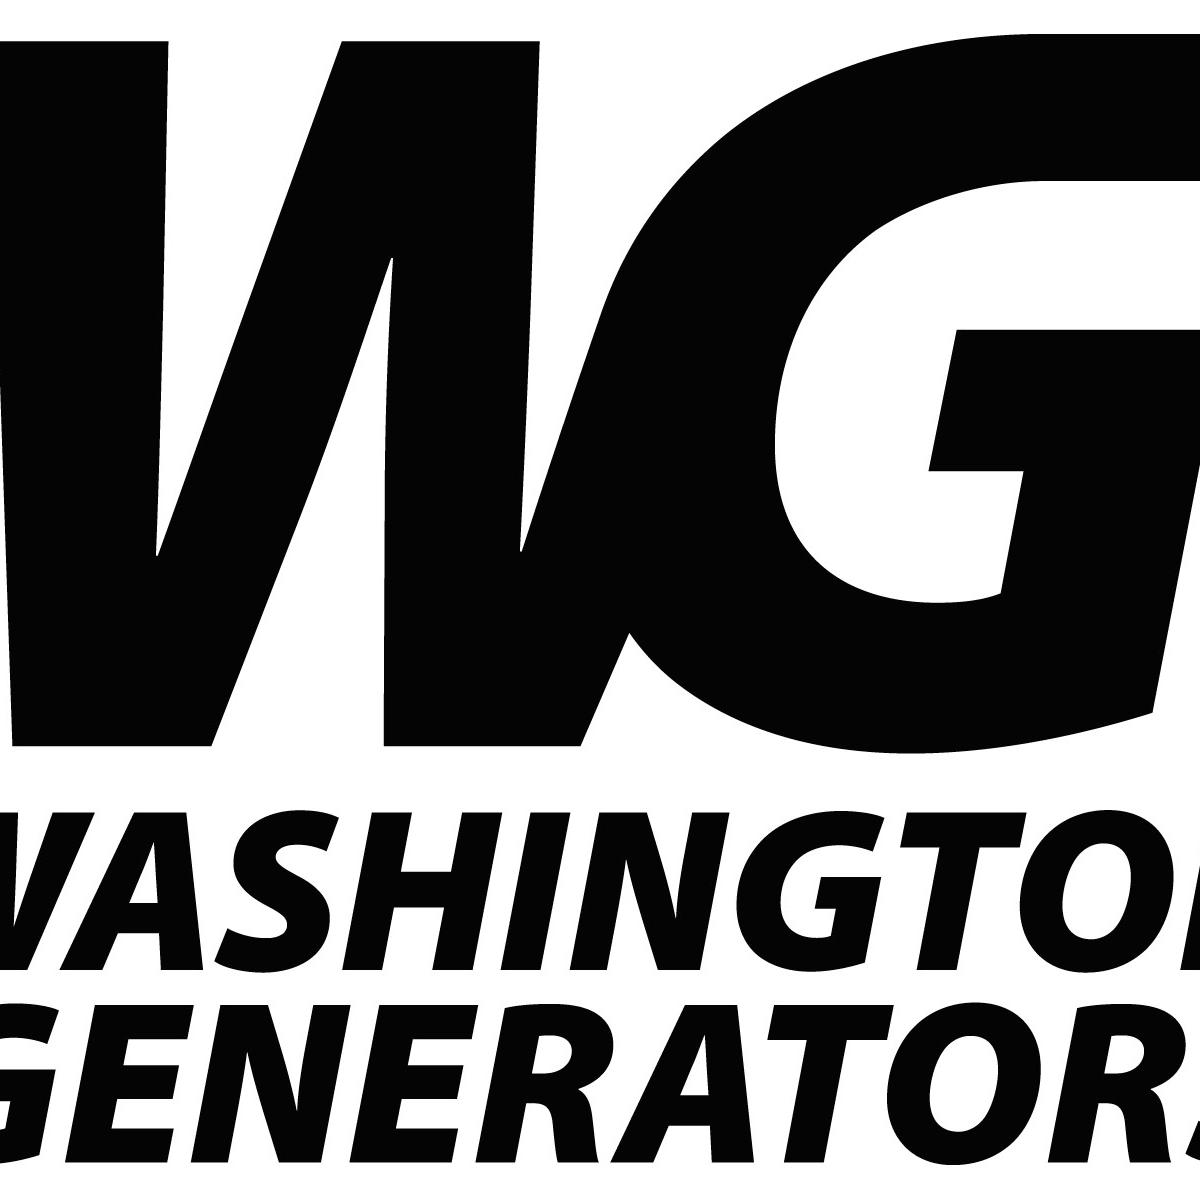 Washington Electric